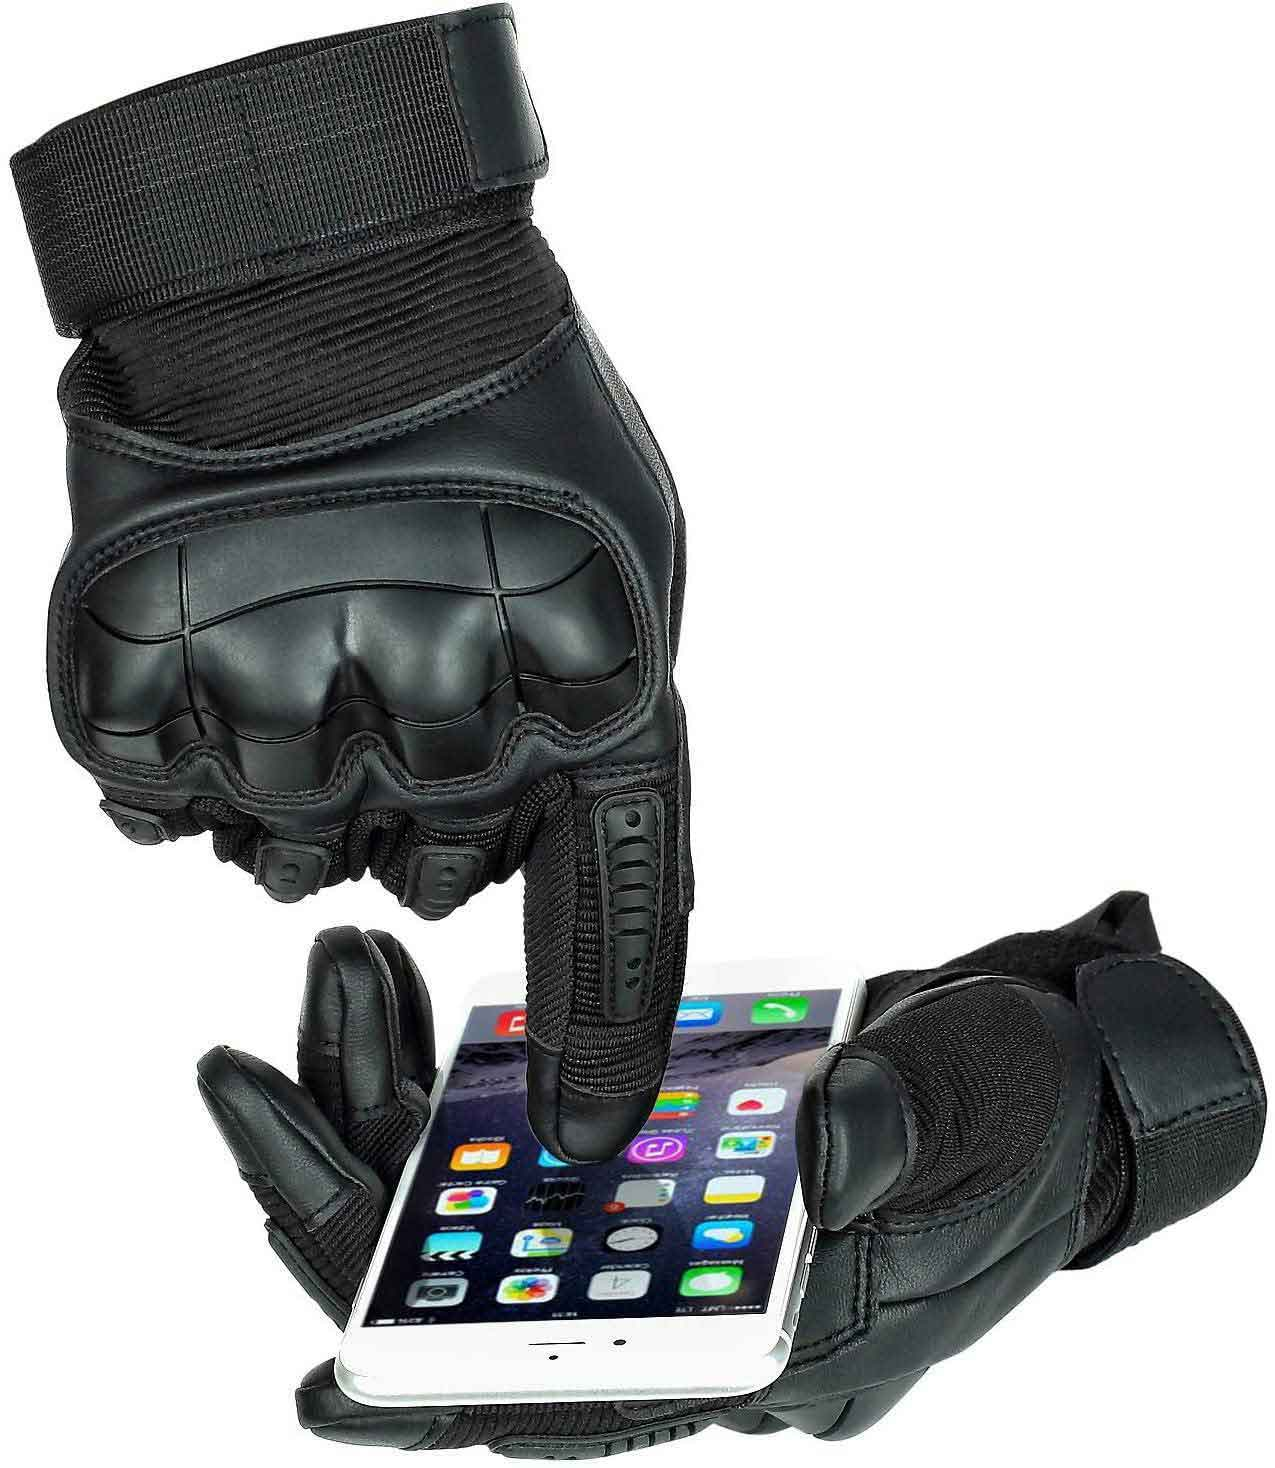 knuckle gloves | knuckle gloves amazon |  knuckle gloves boxing |  knuckle gloves for work |  knuckle gloves for arthritis |  knuckle gloves steel |  knuckle gloves uk |  knuckle gloves walmart |  knuckle glove purpose |  knuckle glove vs |  glove knuckle duster |  glove knuckle protector |  glove knuckle cover |  weighted-knuckle glove |  mr knuckle glove review |  knuckle protector gloves |  knuckle protection gloves |  what is a knuckle glove |  knuckle biker gloves |  knuckle buster gloves |  punk knuckle gloves (black) pubg |  fingerless knuckle gloves black |  bare knuckle boxing glove |  brass knuckle glove |  brass knuckle glove company |  knuckle compression gloves |  knuckles costume gloves |  hard knuckle gloves canada |  weighted knuckle gloves canada |  hard knuckle gloves california |  hard knuckle gloves ebay |  knuckle gloves fashion |  knuckles gloves for heavy bag |  knuckle for gloves |  knuckles fighting gloves |  knuckles finger gloves |  hard knuckle gloves for punching |  knuckle guard gloves |  knucklehead gloves |  hard knuckle glove |  hockey knuckle glove |  homemade knuckle glove |  gloves with hard knuckles |  jiusy knuckle gloves |  gloves reinforced knuckles |  knuckle tactical gloves |  leather knuckle gloves |  metal knuckle gloves |  mr knuckle gloves |  mr knuckle gloves review |  mr knuckle gloves amazon |  mr knuckle gloves australia |  mr knuckle gloves uk |  mr knuckle arthritis gloves |  mr knuckle compression gloves amazon |  hard knuckle gloves near me |  knuckle out gloves |  hard knuckle gloves oakley |  knuckle protection glove |  knuckle plated gloves |  knuckle padded gloves |  knuckle protection gloves for boxing |  knuckles plush gloves |  hard knuckle gloves punch |  knuckle gloves reddit |  dragon knuckle gloves review |  hard knuckle gloves review |  first tactical hard knuckle glove review |  punk knuckle gloves (red) |  knuckle tattoo gloves |  knuckle touchscreen gloves |  hard knuckle tactical glove |  hwi hard